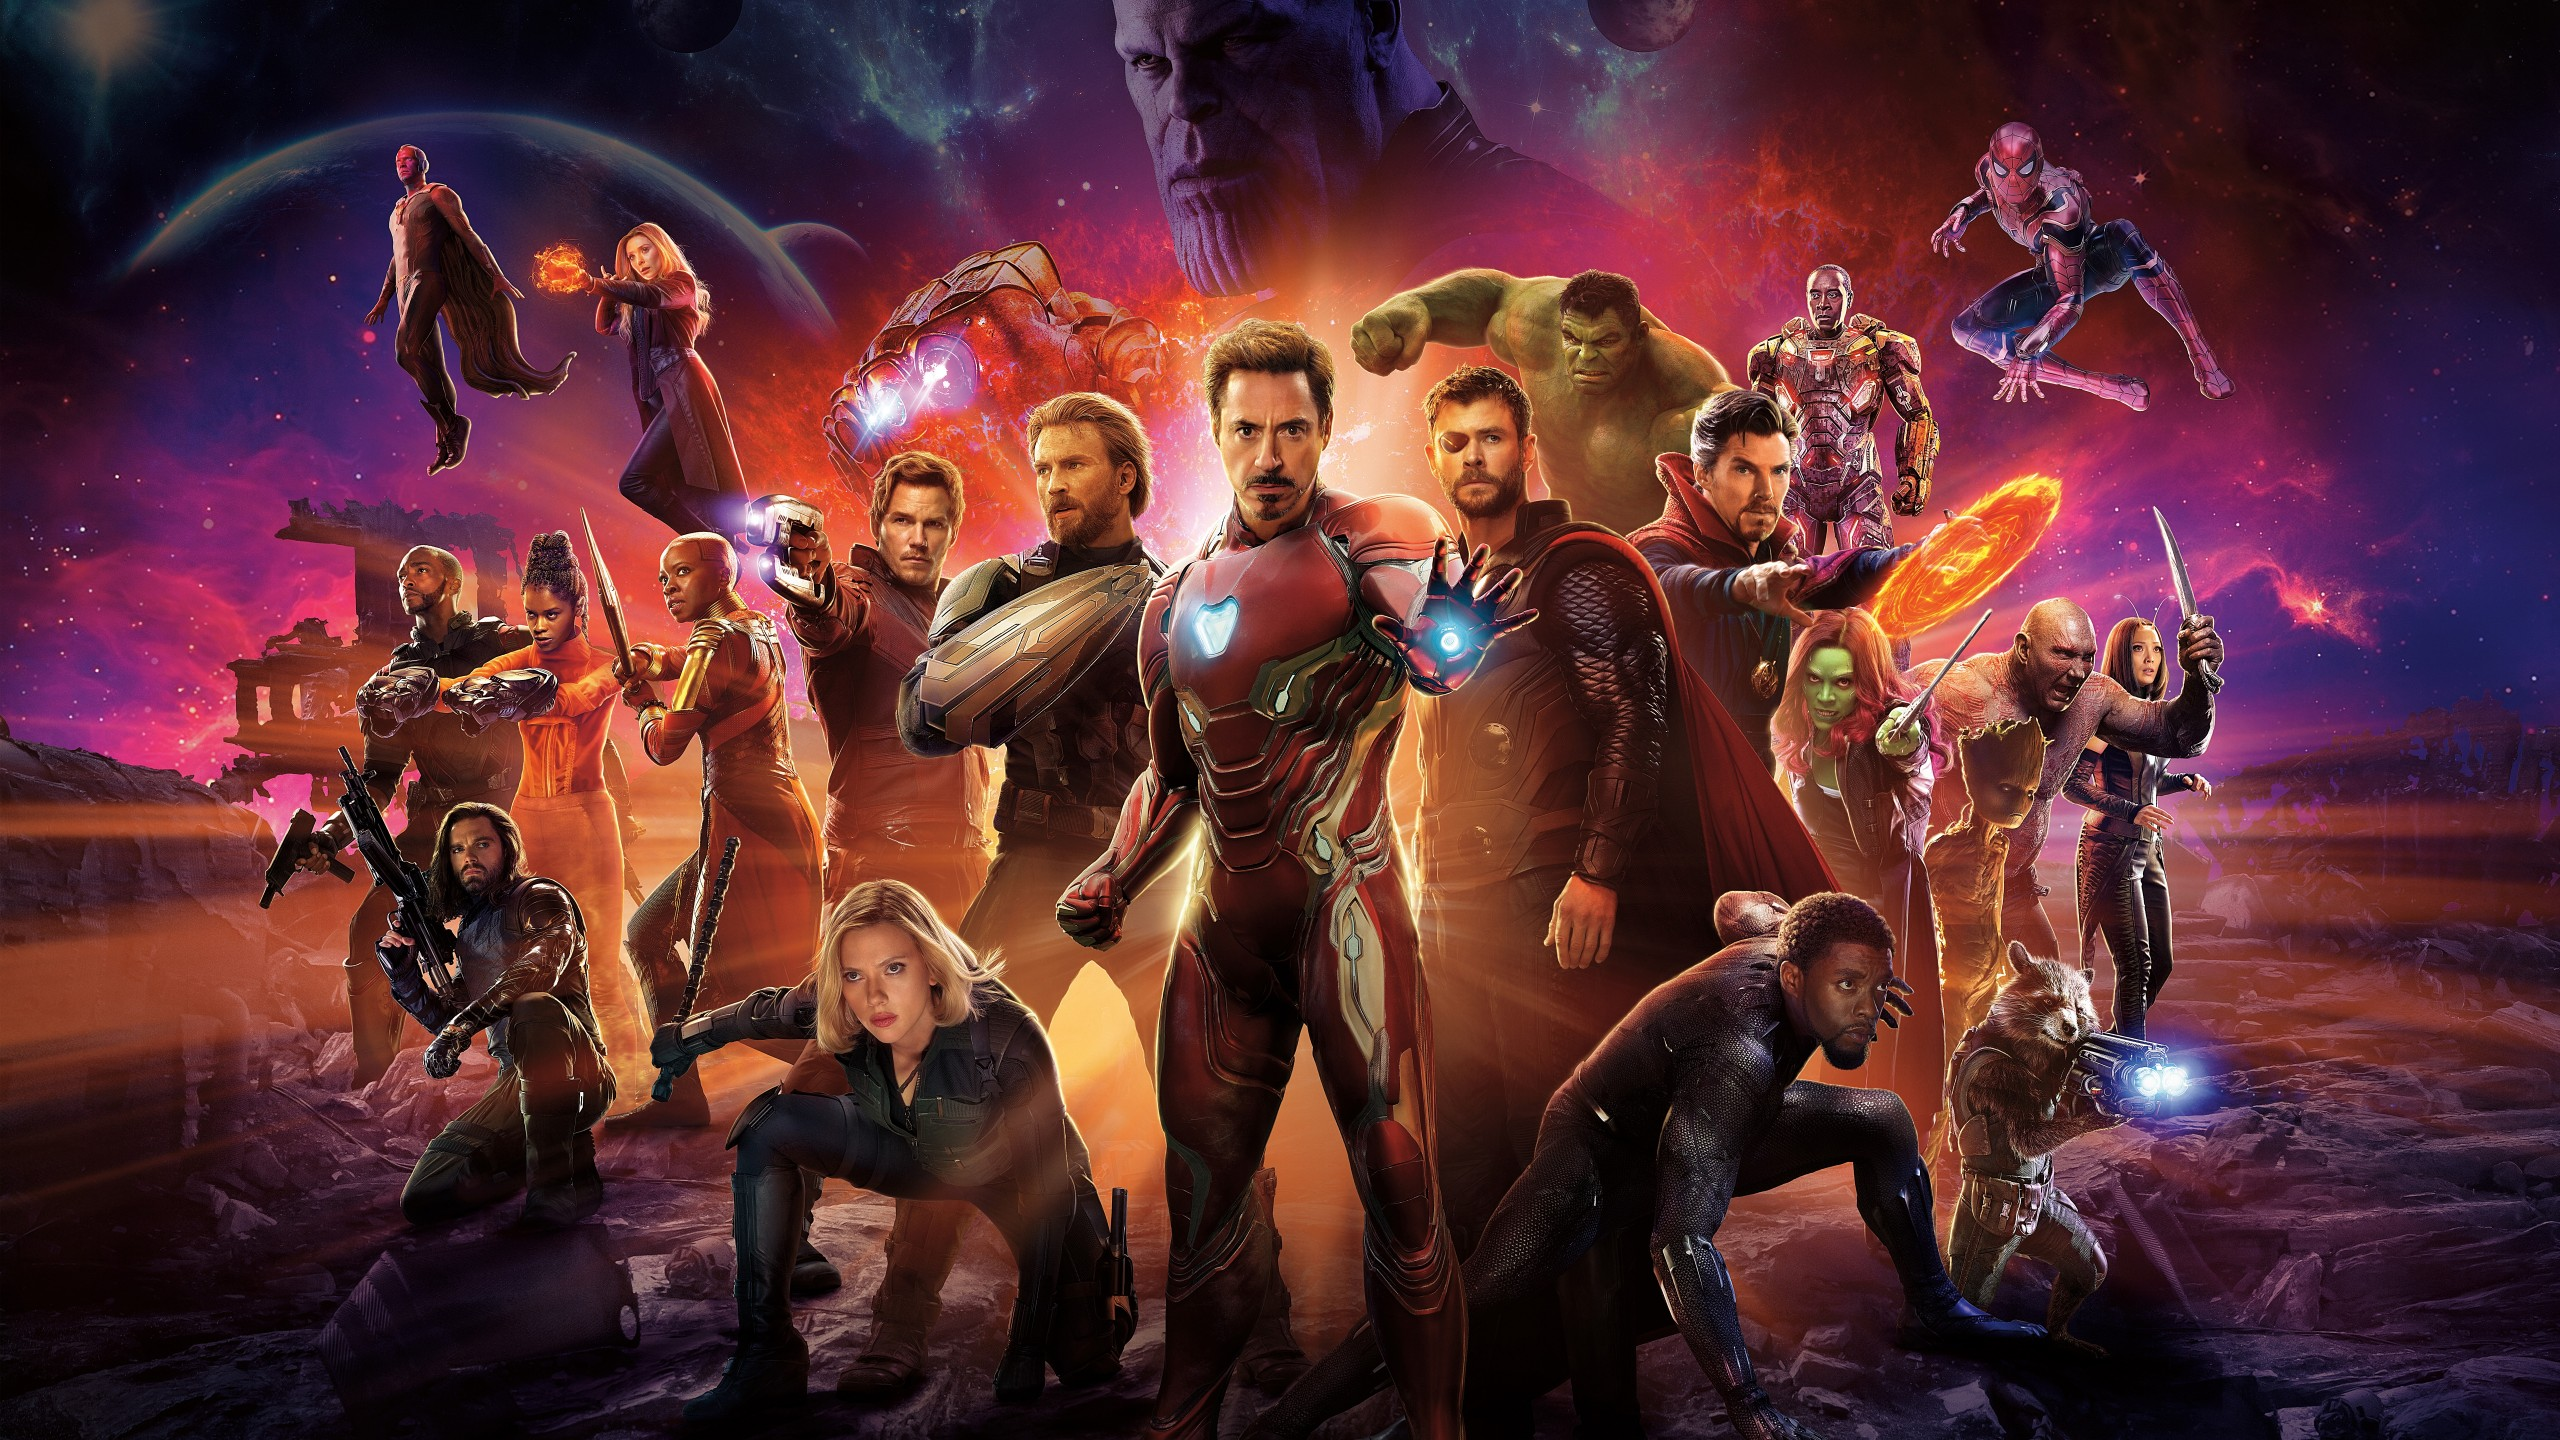 Superman Hd Wallpaper For Iphone 5 Avengers Infinity War Superheroes Cast 4k 8k Wallpapers